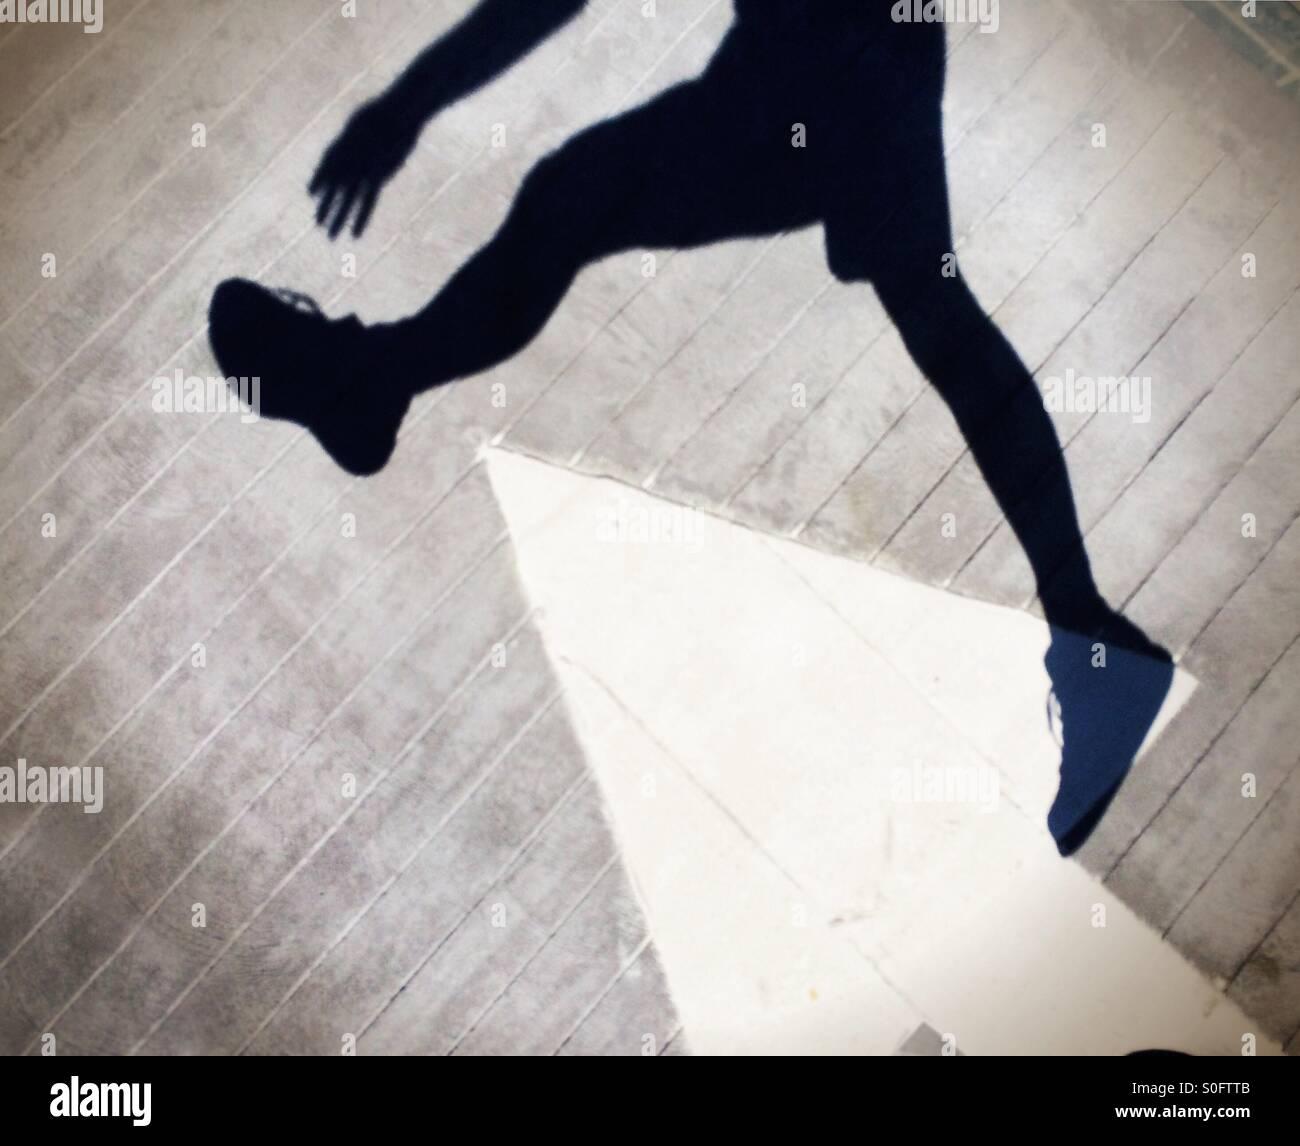 Man jumping over arrow Photo Stock